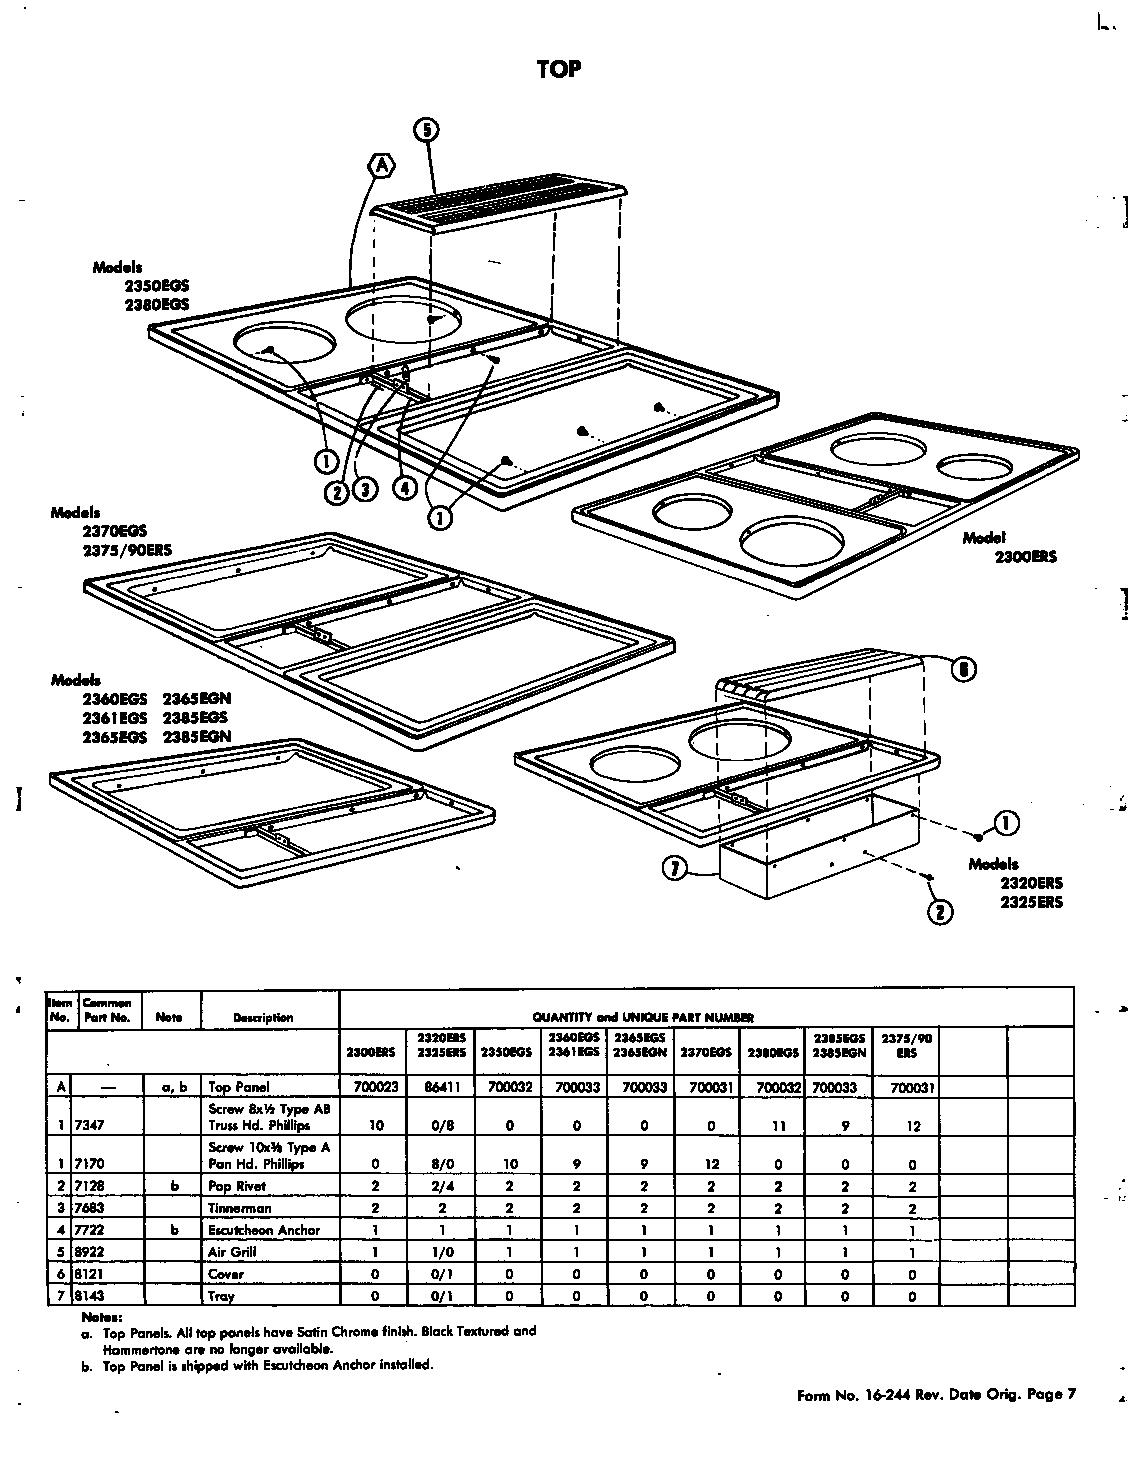 Jenn-air model 2300ERS ranges, electric genuine parts